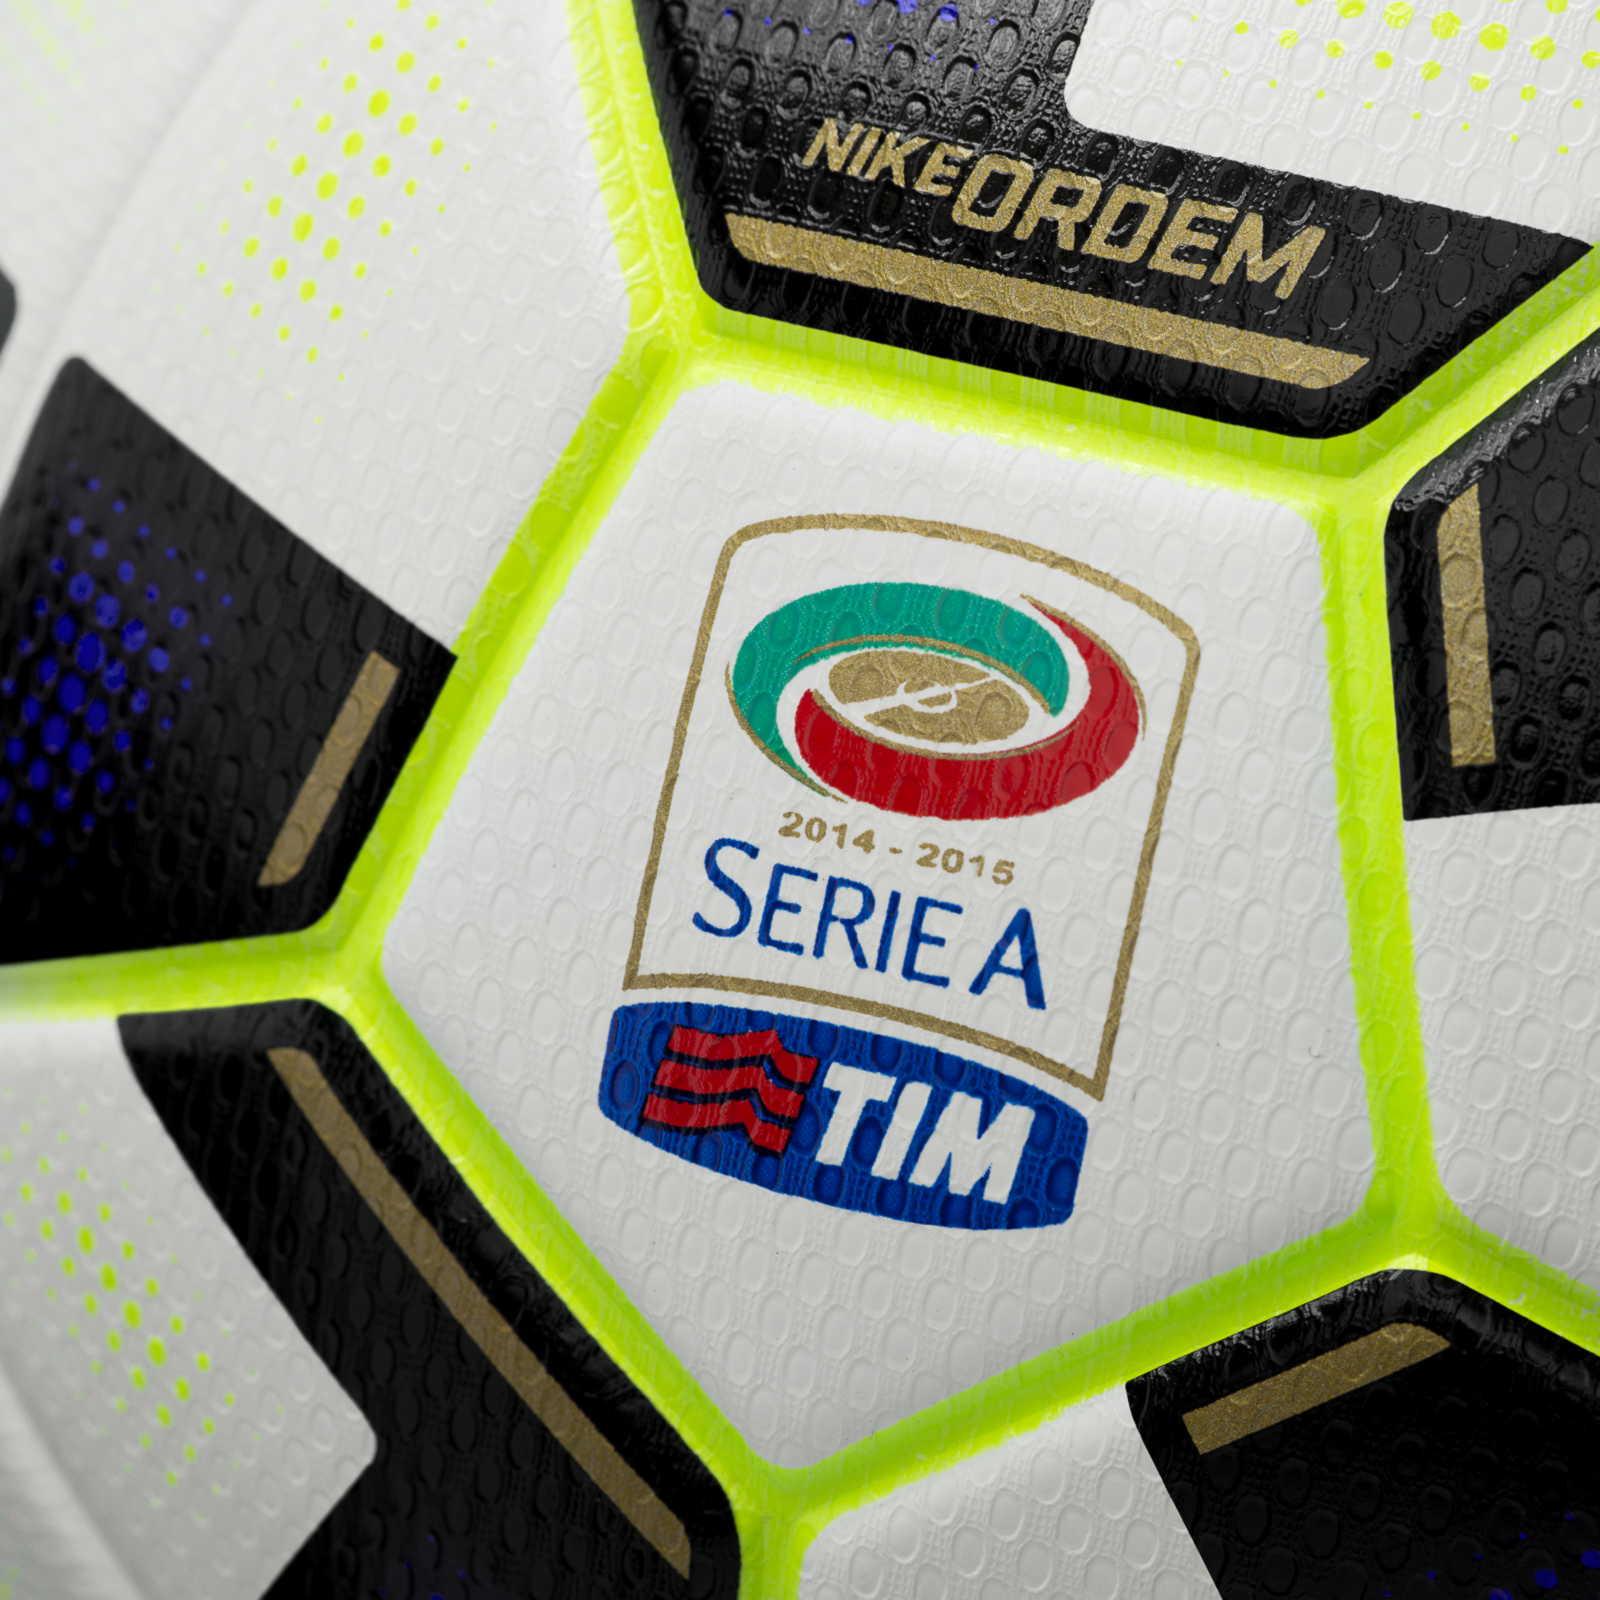 Nike Ordem Serie A 14-15 Ball Released - Footy Headlines